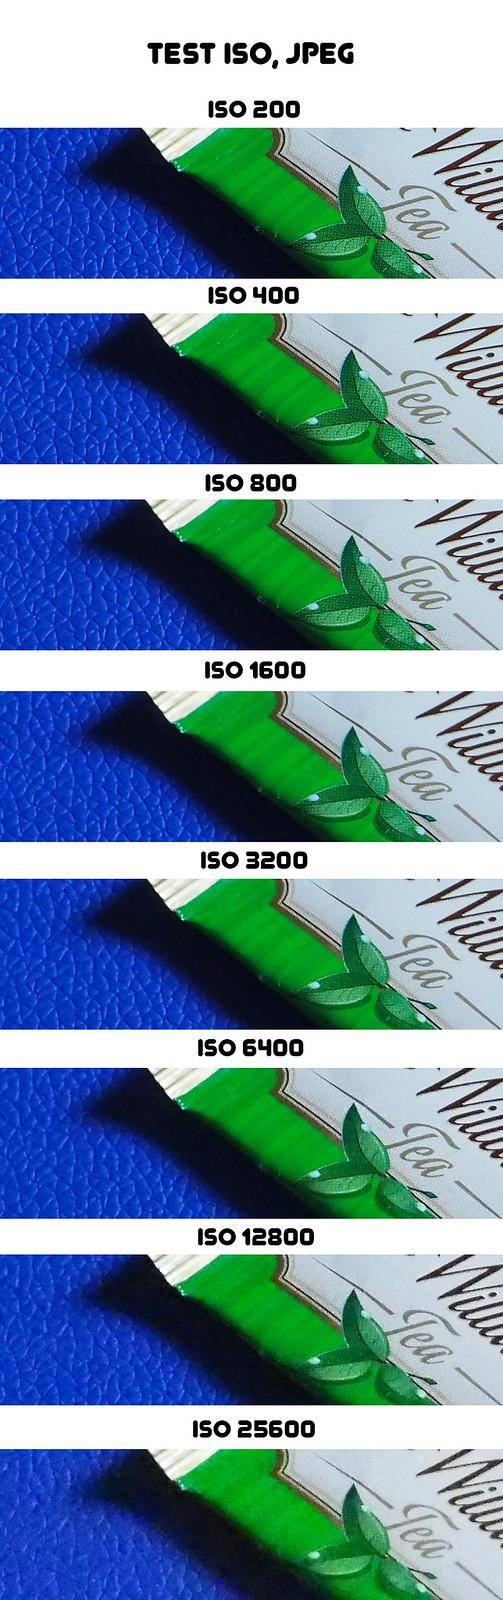 Olympus OM-D E-M10 - test ISO, JPEG